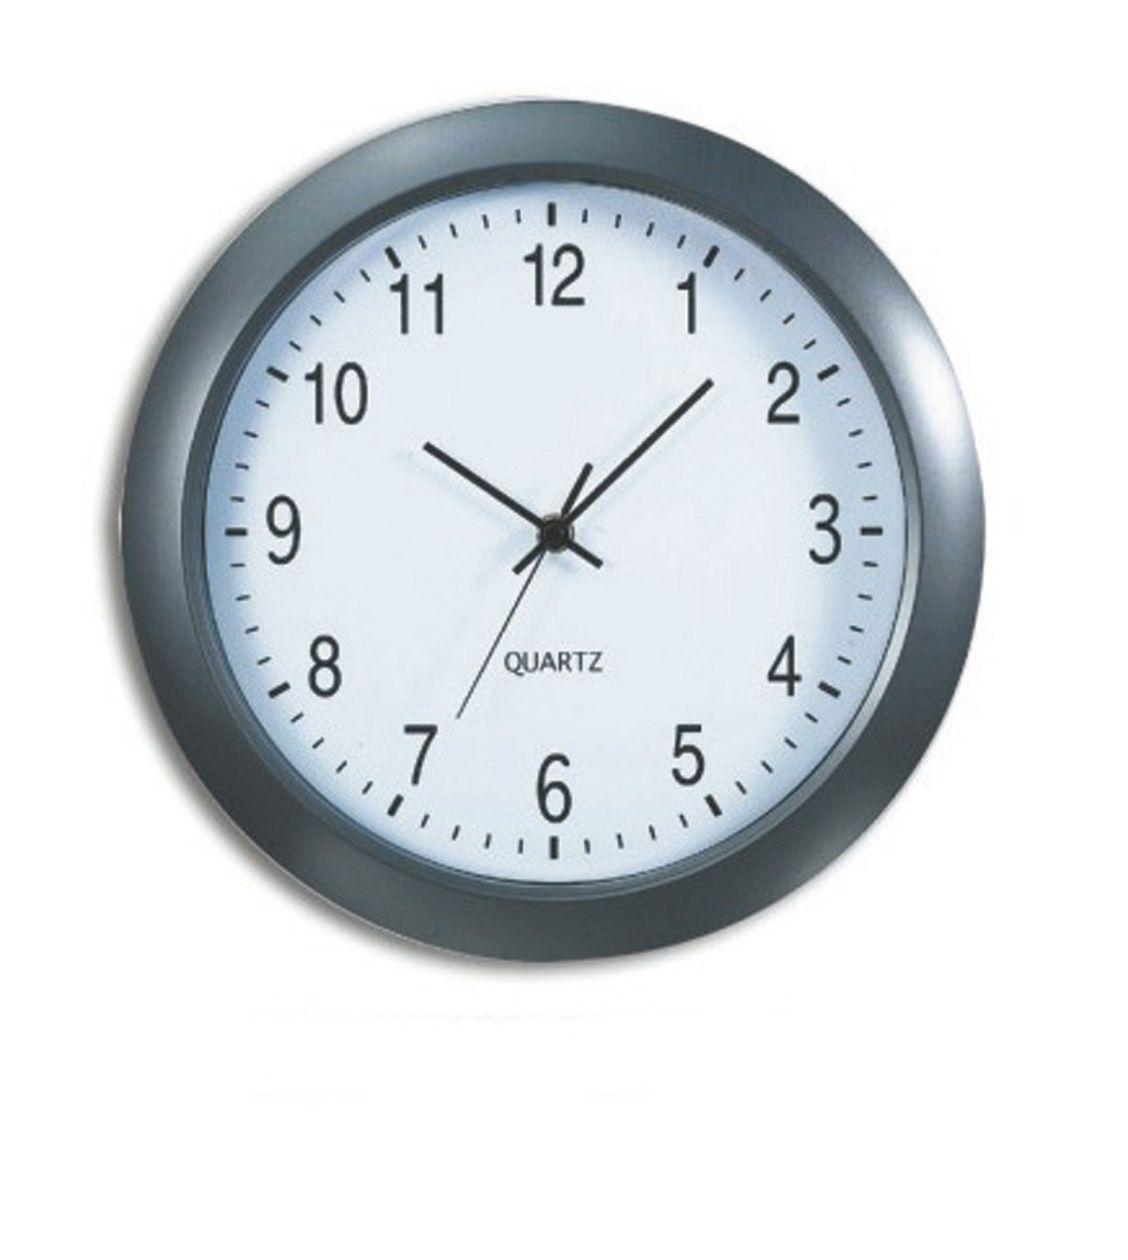 Nástěnné analogové hodiny Prague, 30 cm, šedé Methodo